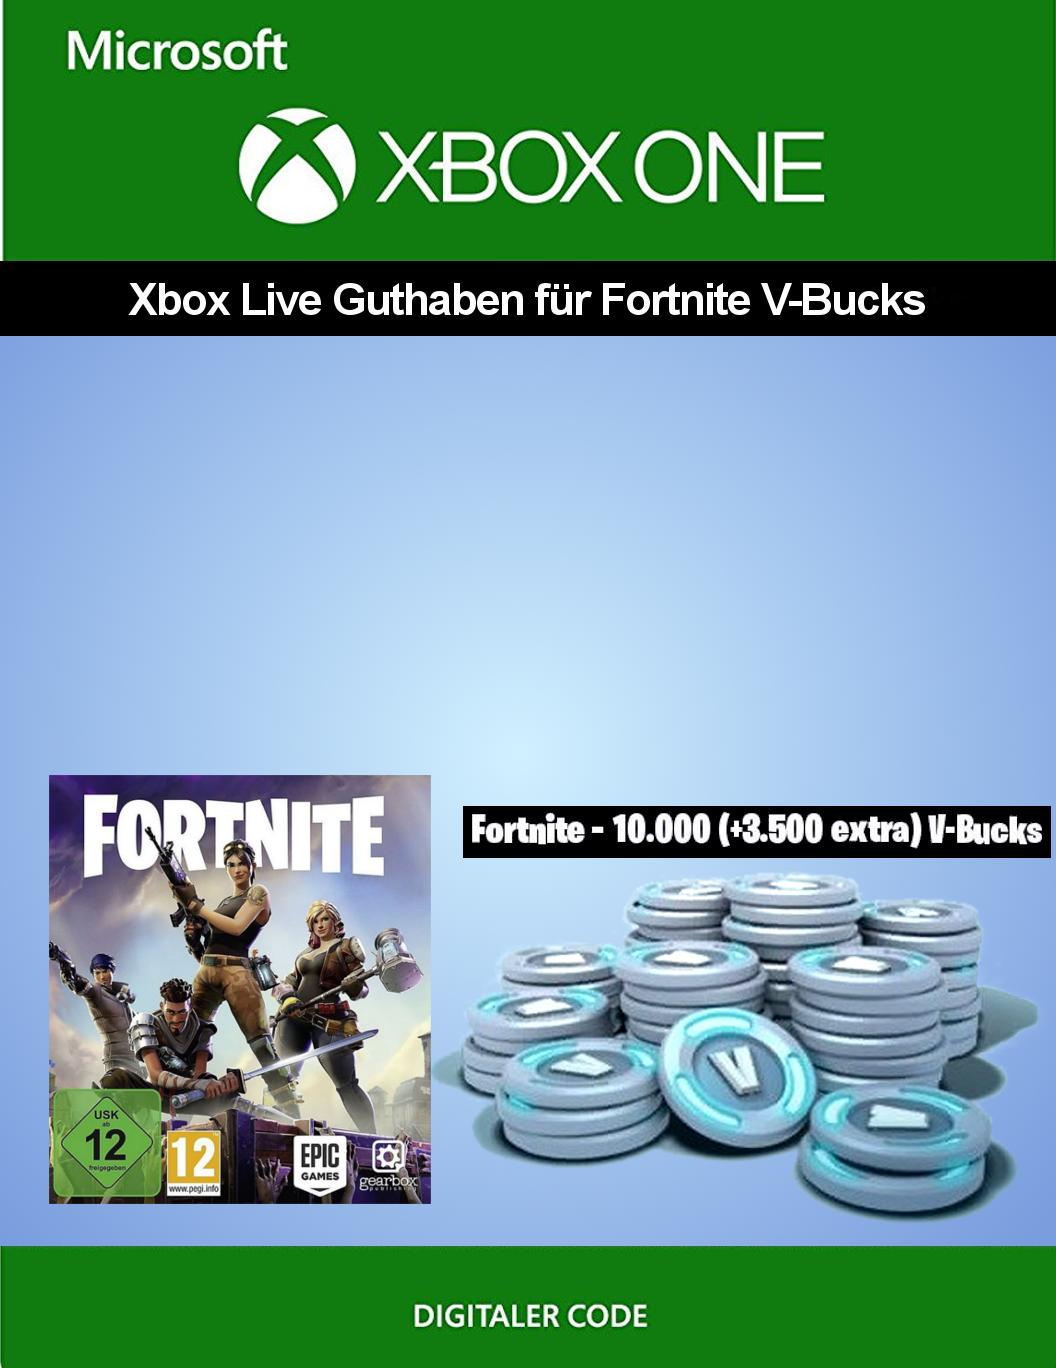 Xbox Live Guthaben für Fortnite - 10.000 V-Bucks + 3.500 extra V-Bucks   Xbox One - Download Code [PC Code - Kein DRM]